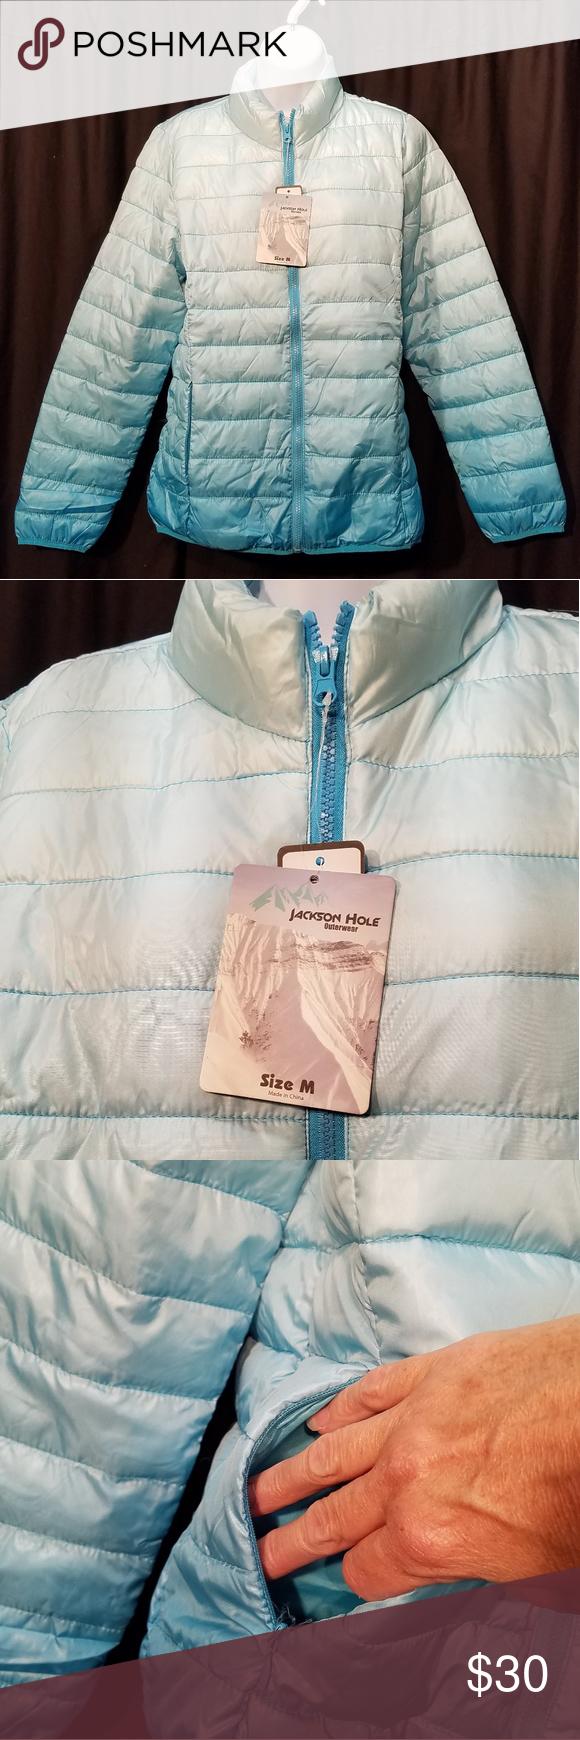 Jackson Hole Ombre Blue Puffer Jacket New Jackson Hole Outwear Ombre Blue Size Medium Long Sleeve Puffer Vest Wit Blue Puffer Jacket Blue Ombre Puffer Jackets [ 1740 x 580 Pixel ]